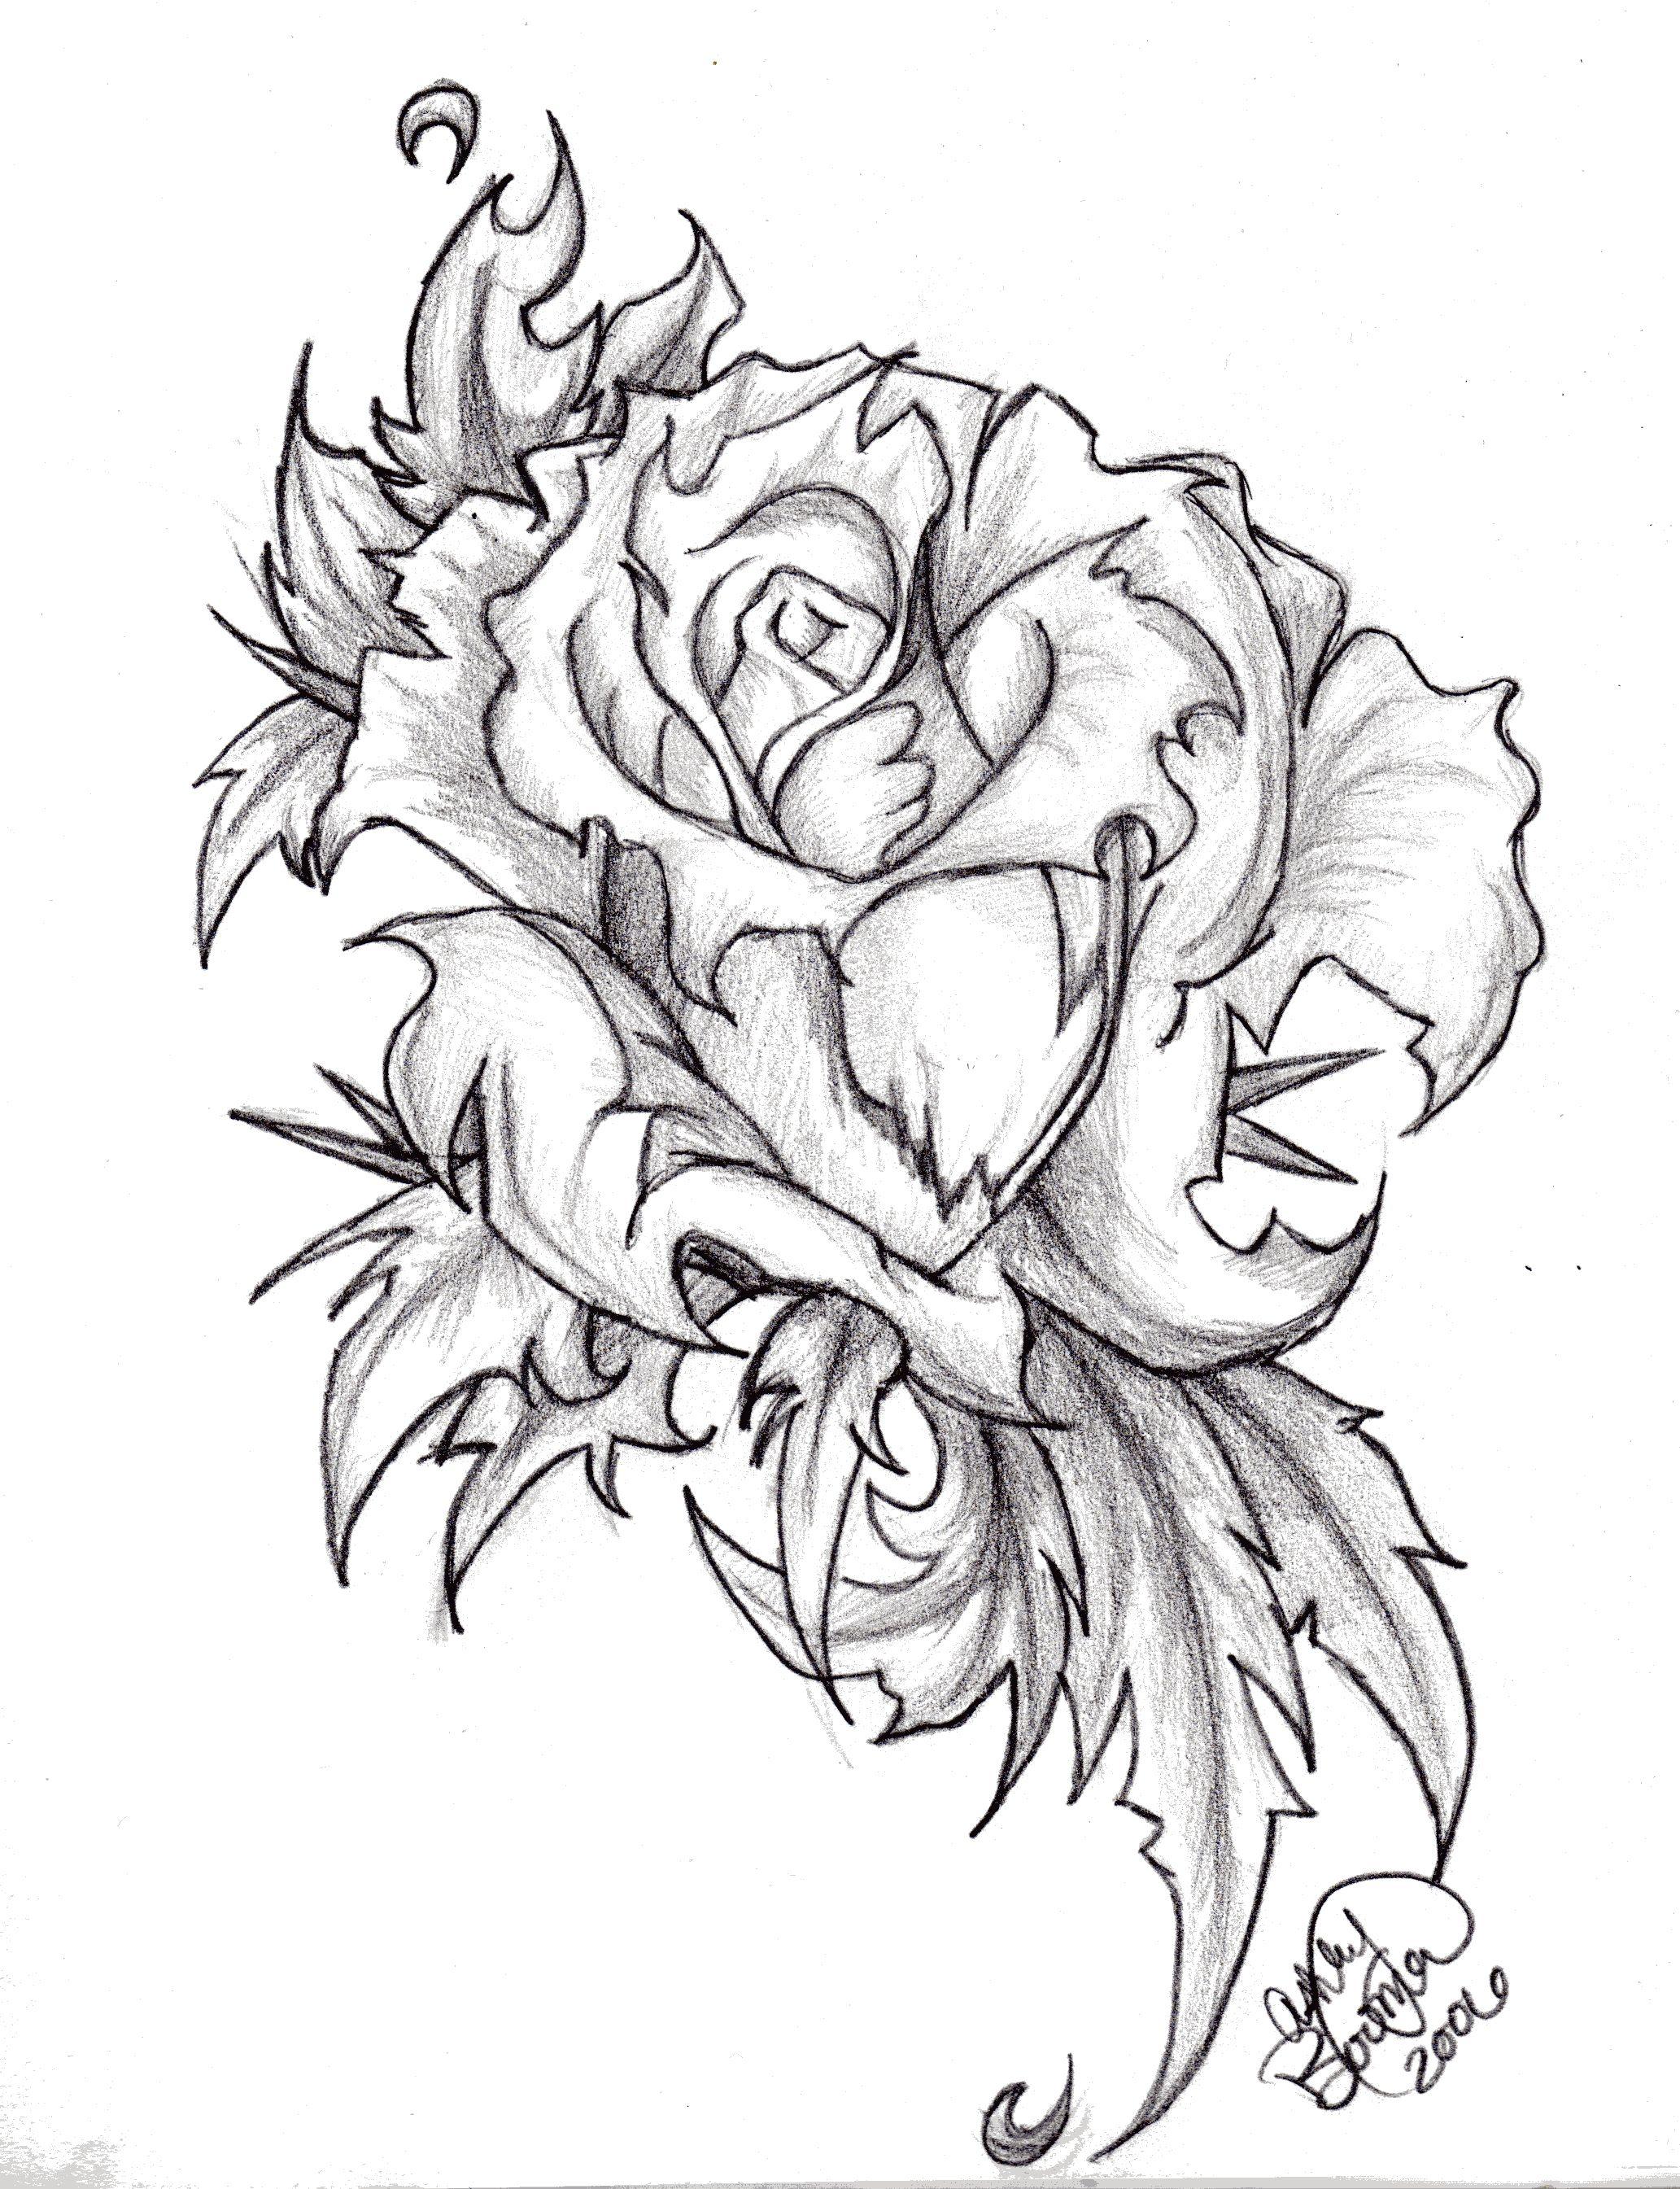 drawings of roses - HD2065×2690